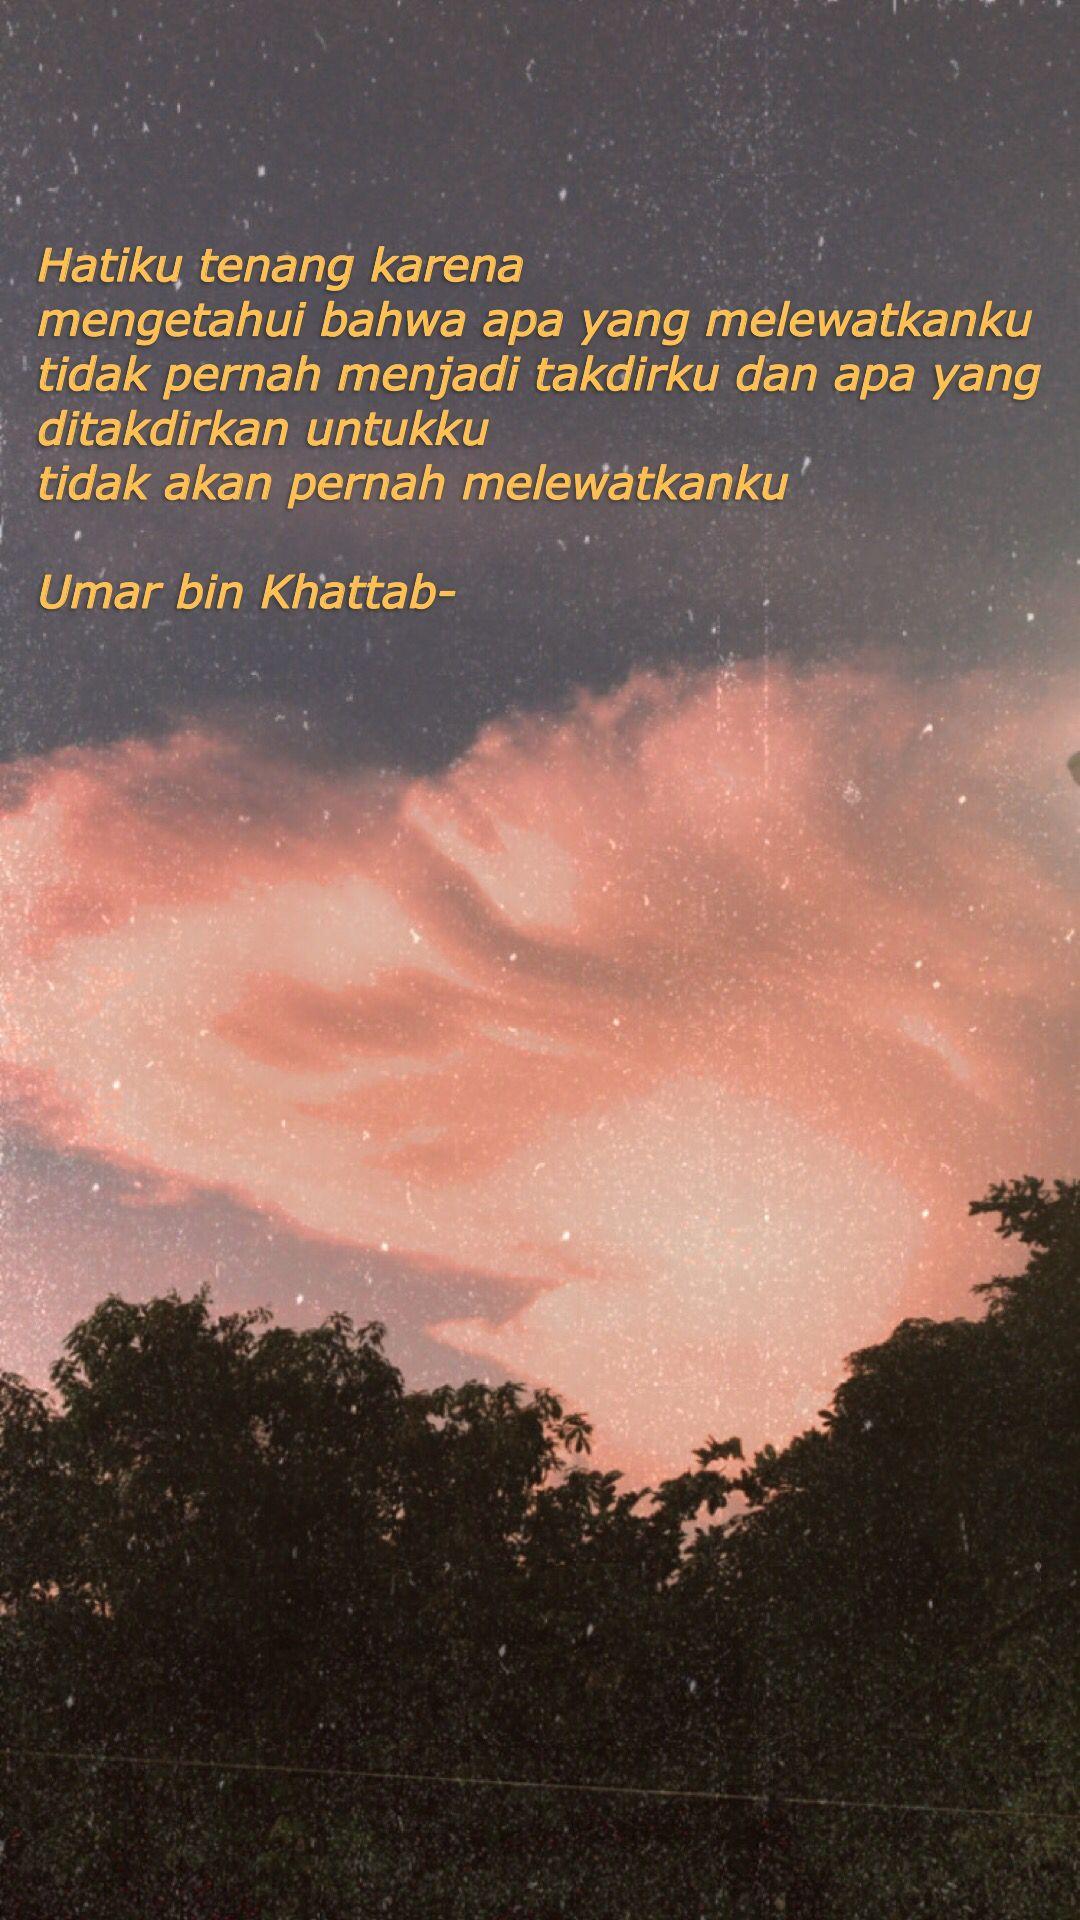 Umar Bin Khattab Quotes Kata Kata Motivasi Buku Remaja Kutipan Agama